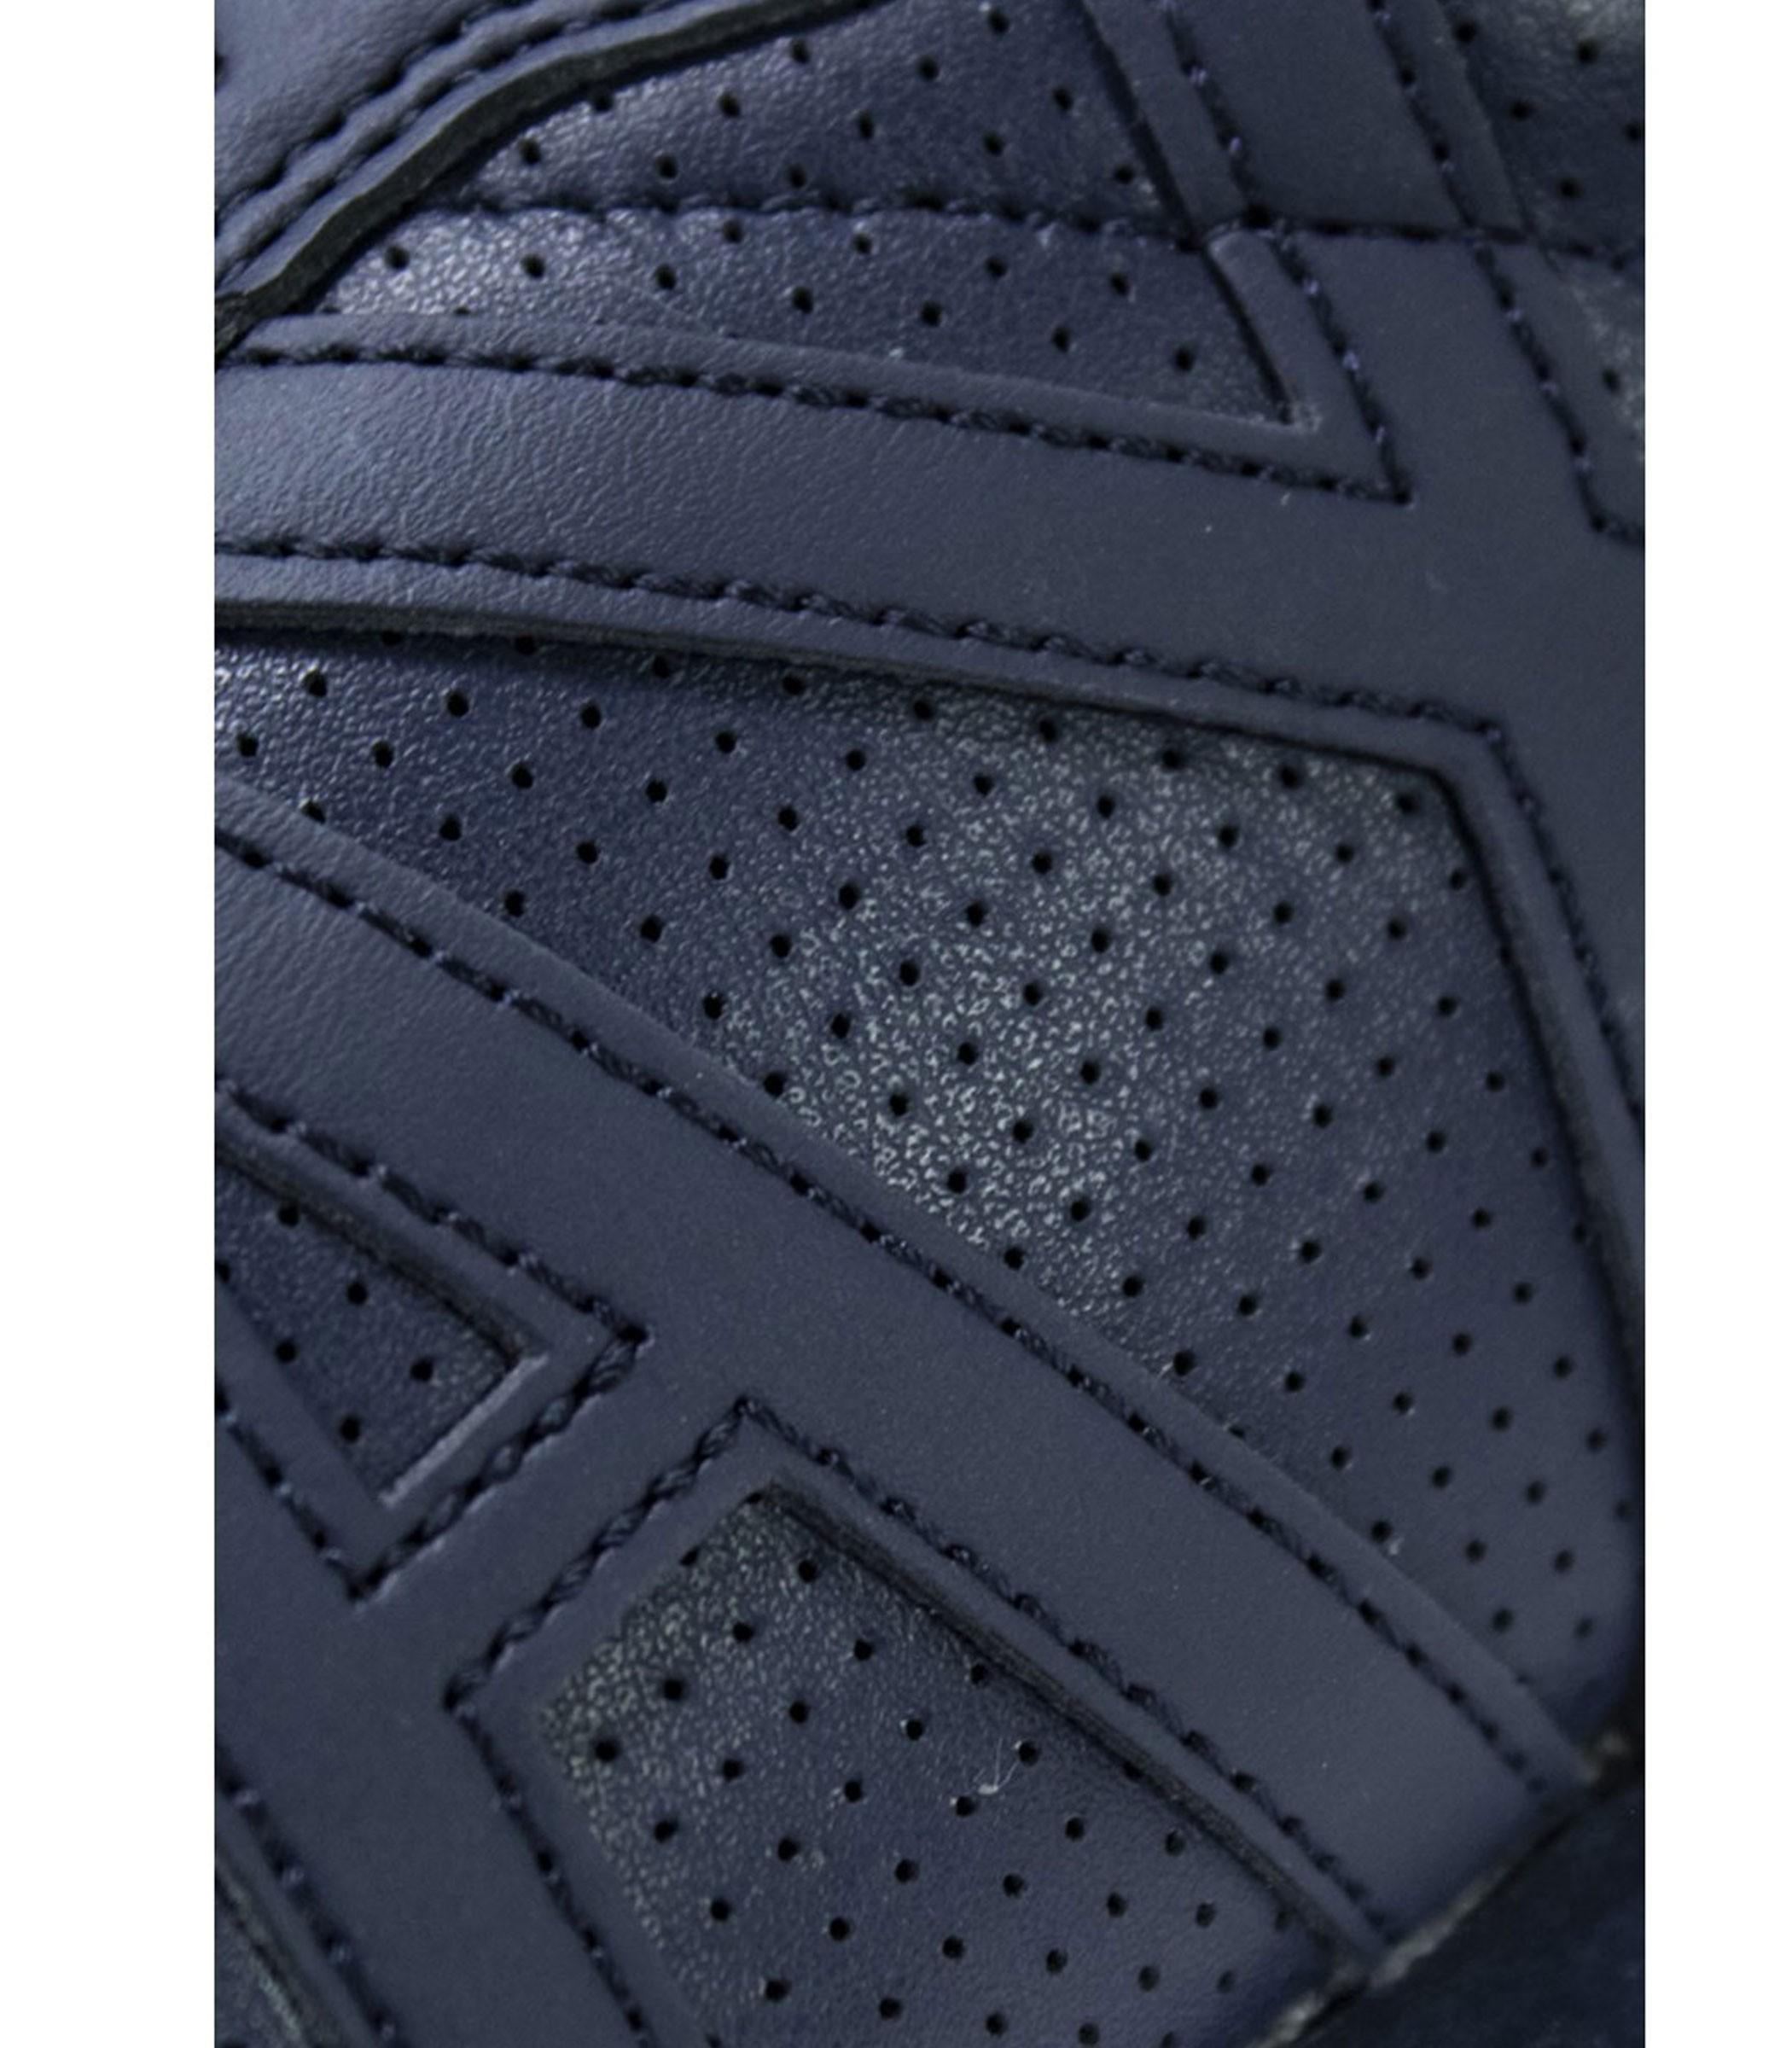 XUX017 XCC04 Scarpe da uomo Armani Exchange tinta unita colore blu in pelle  traforata Rif. XUX017 XCC04 5dd2aaef4e1